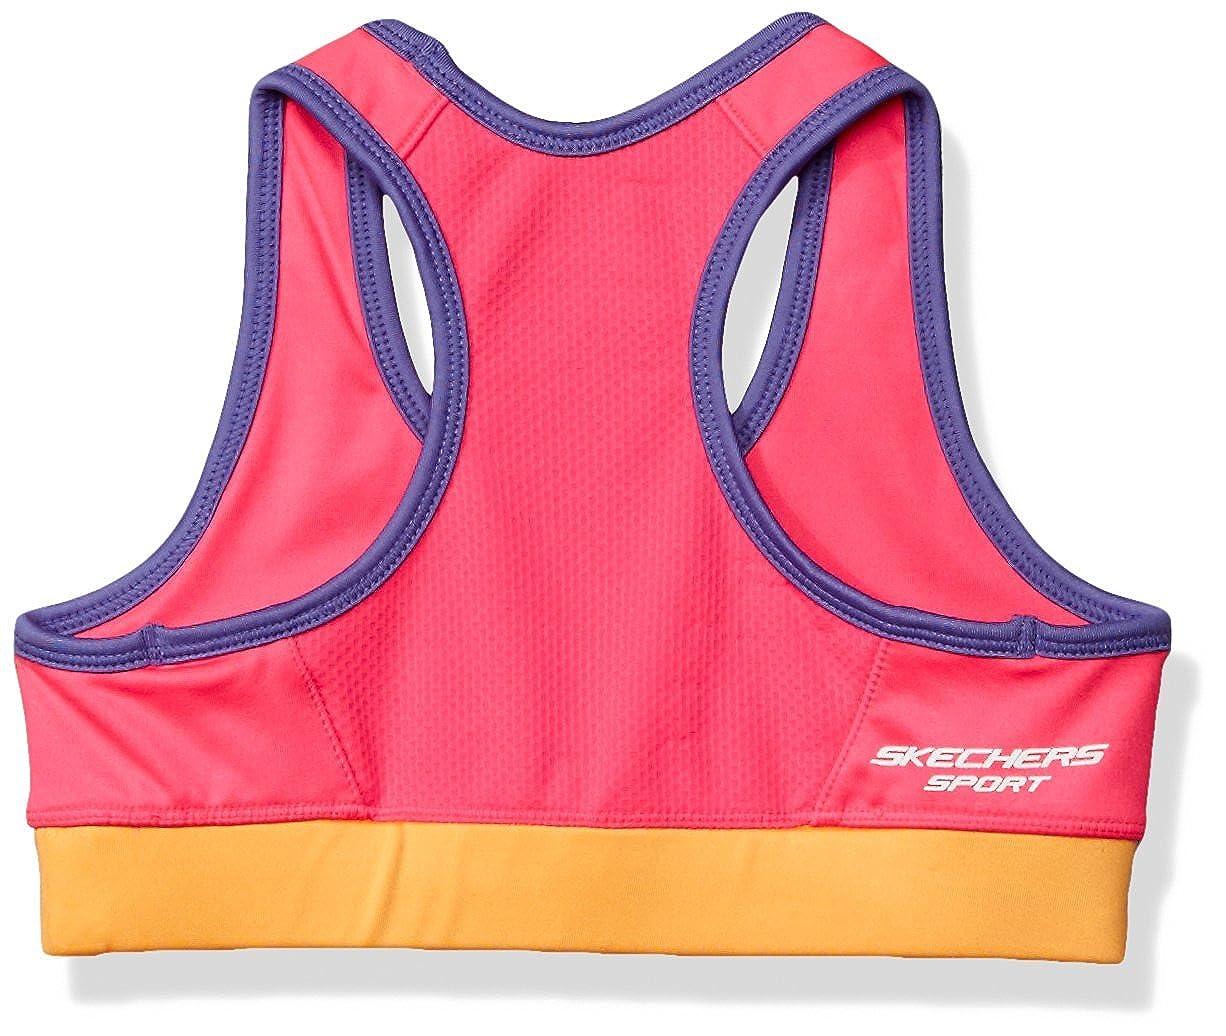 d2c65c6b86 Amazon.com  Skechers Big Girls  Sport Core Bra